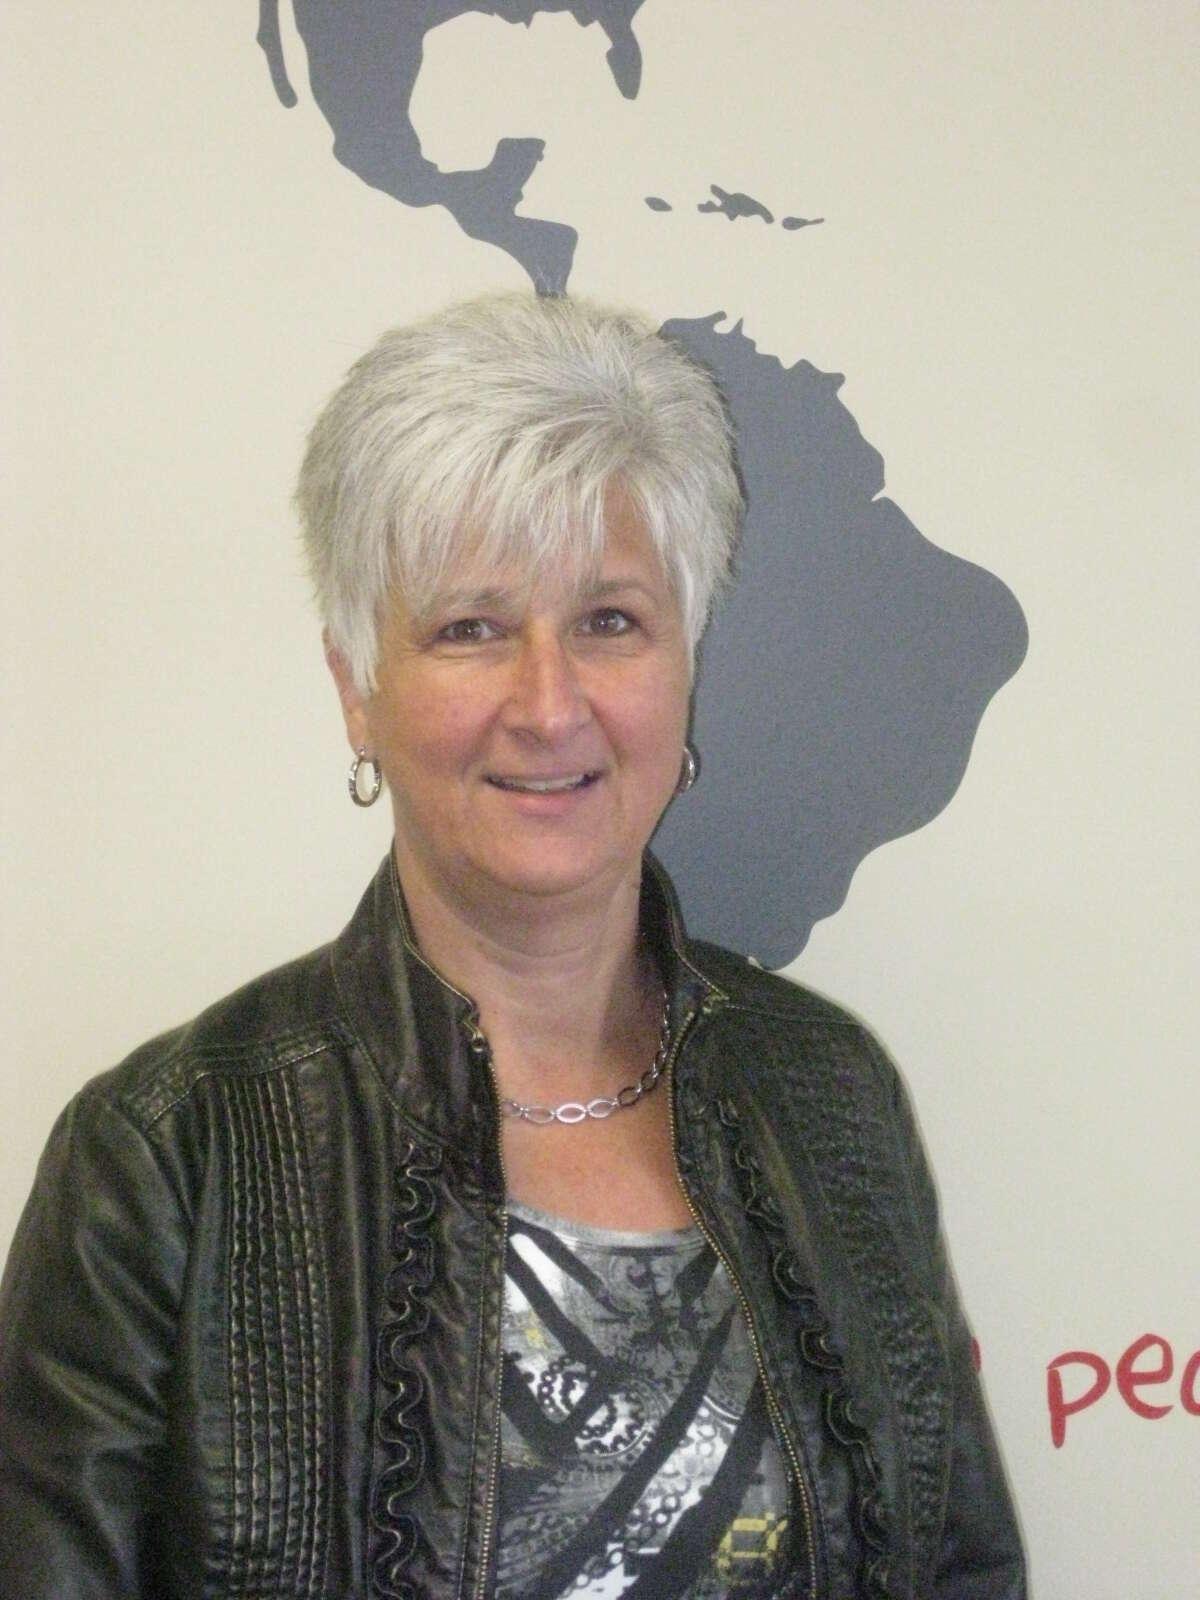 Kathy Schonenberger CTC